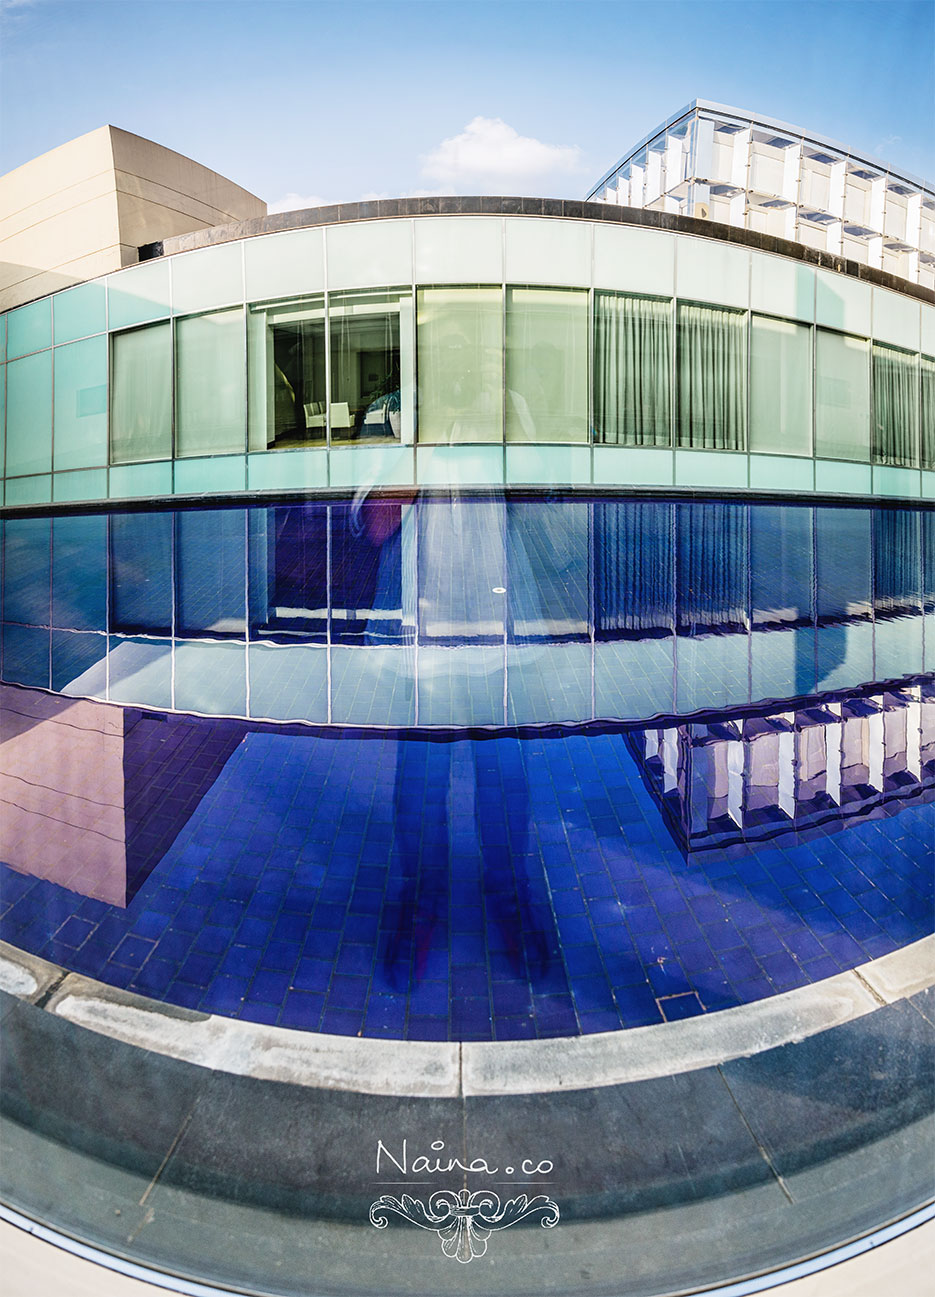 The Oberoi Hotel, Gurgaon. Blue tiles, water and blue skies. Photography by photographer Naina Redhu of Naina.co